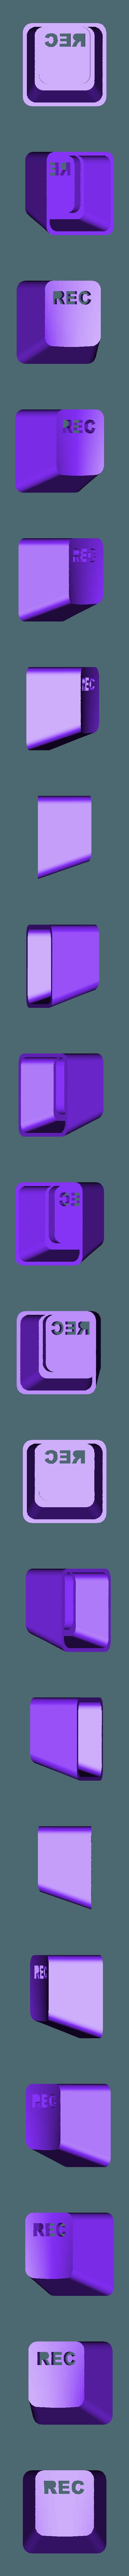 key_rec.stl Download free STL file Key cap • 3D printing object, MakeItWork